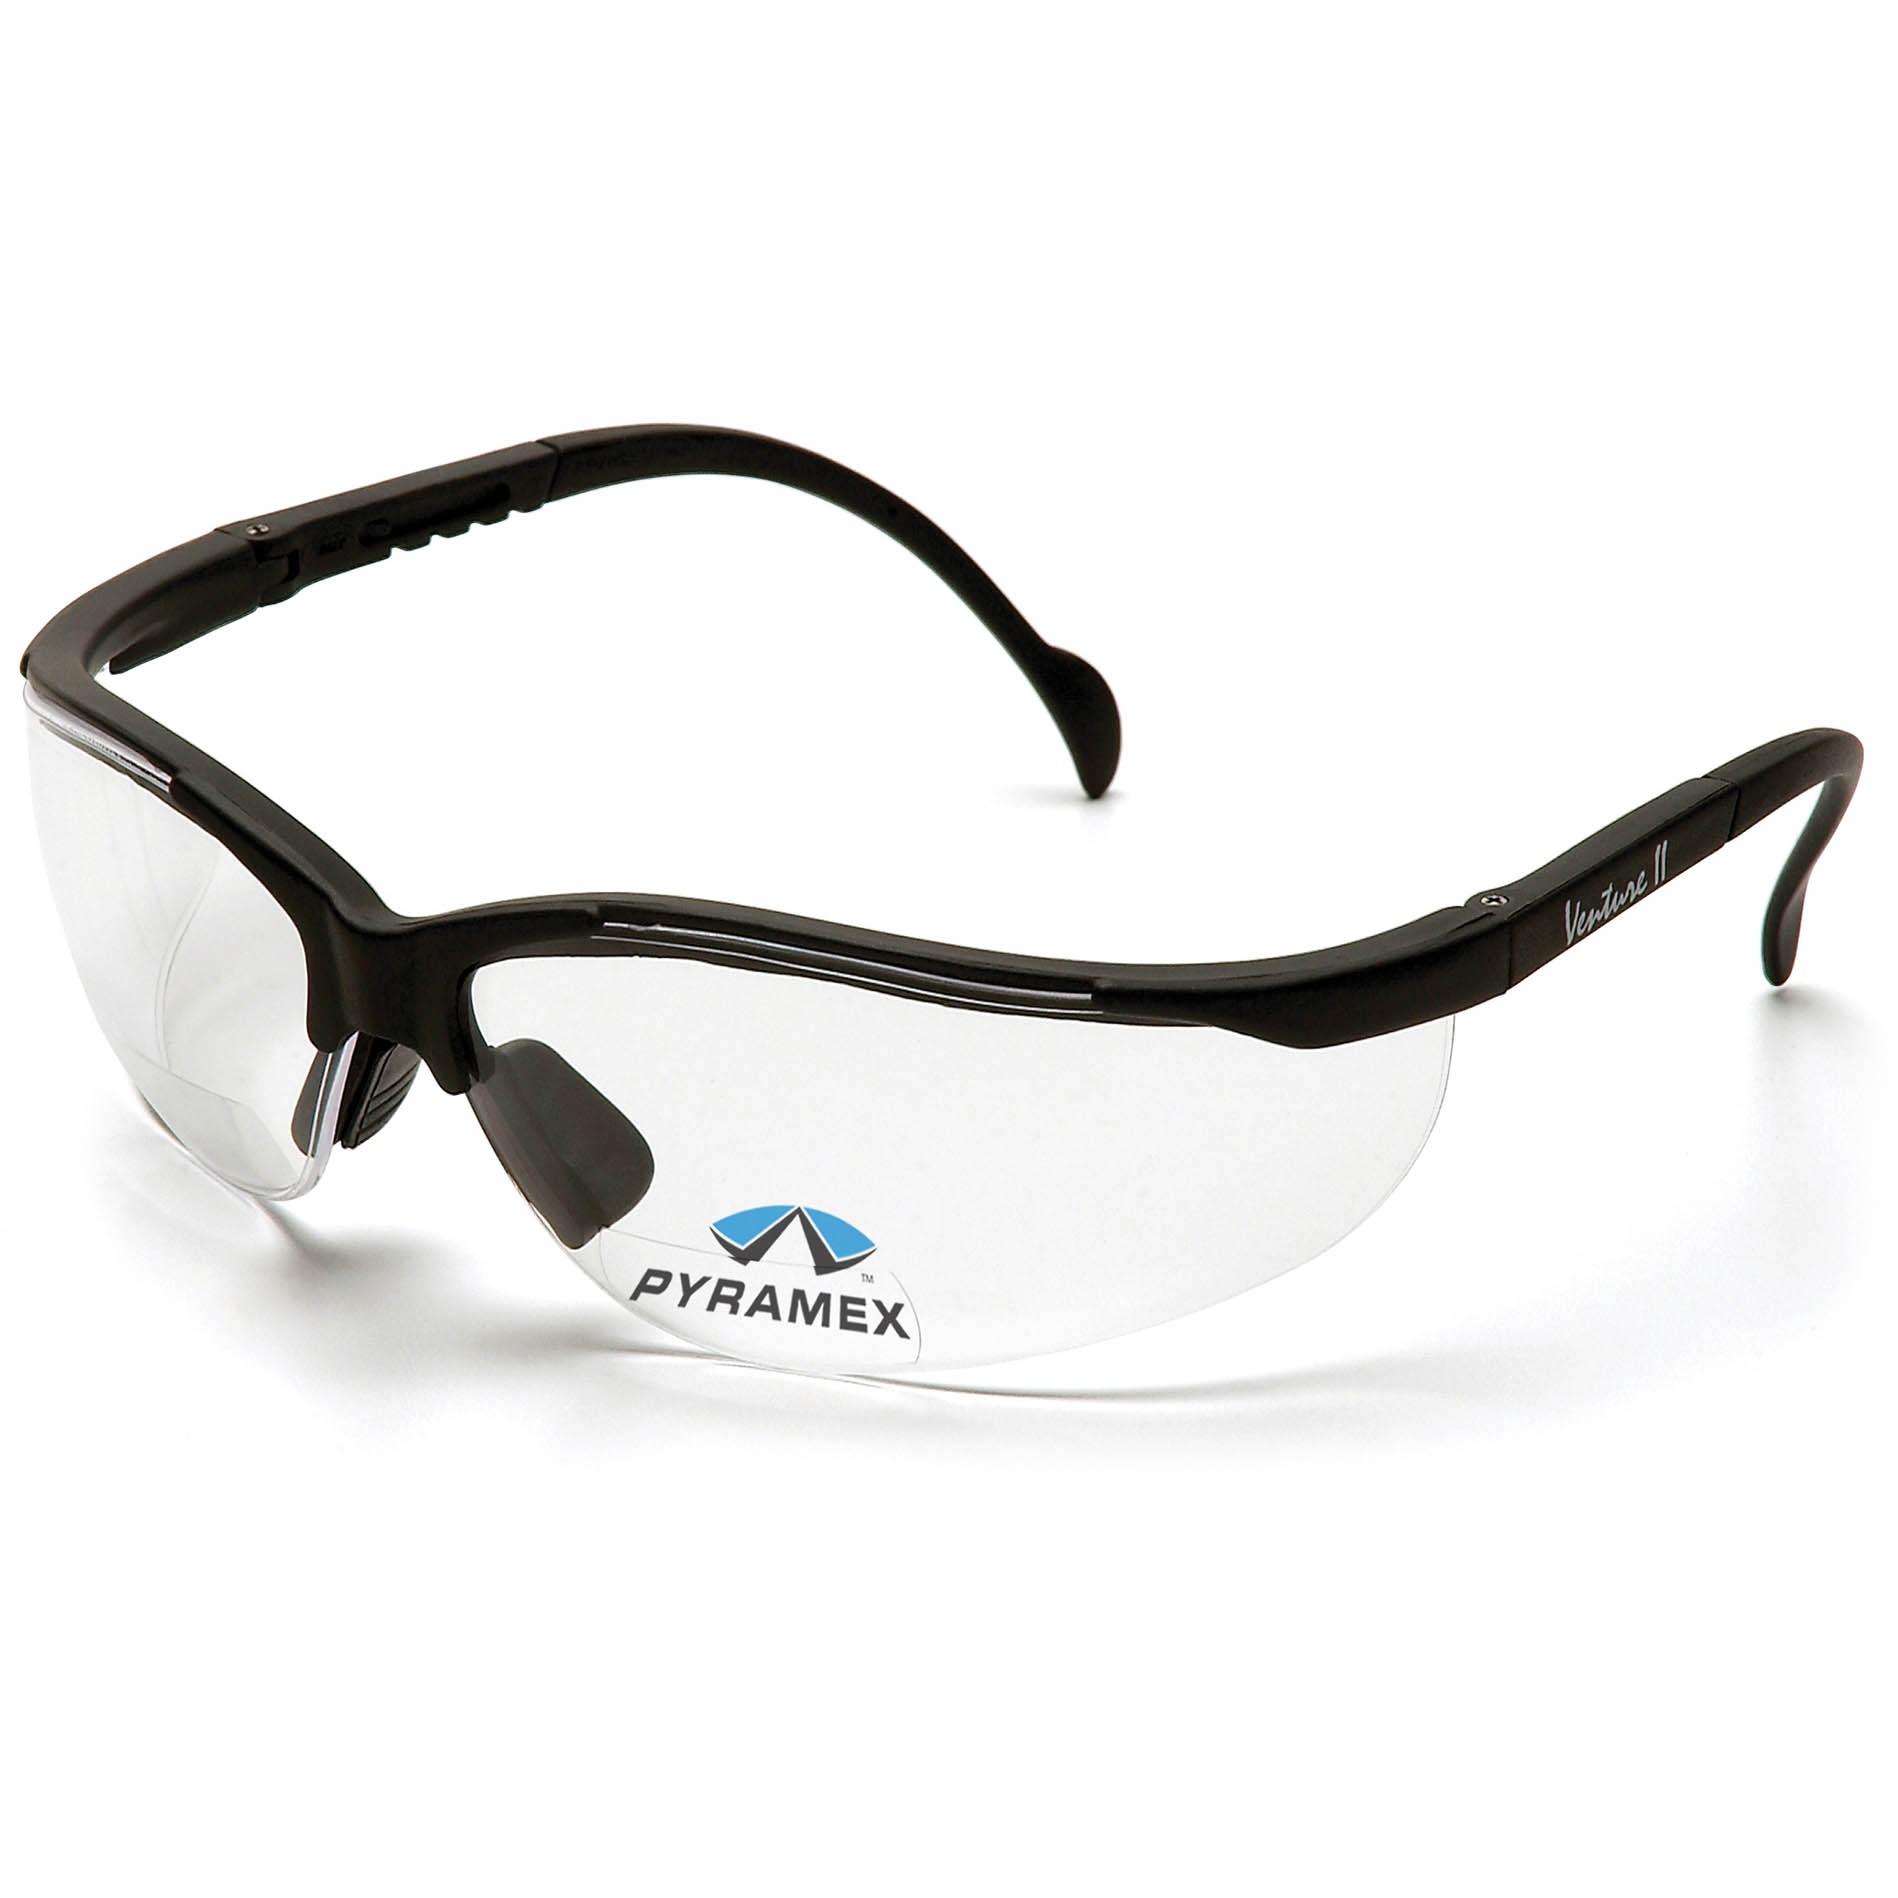 Eyeglass Frame Markings : Pyramex SB1810R Venture II Readers Safety Glasses - Black ...